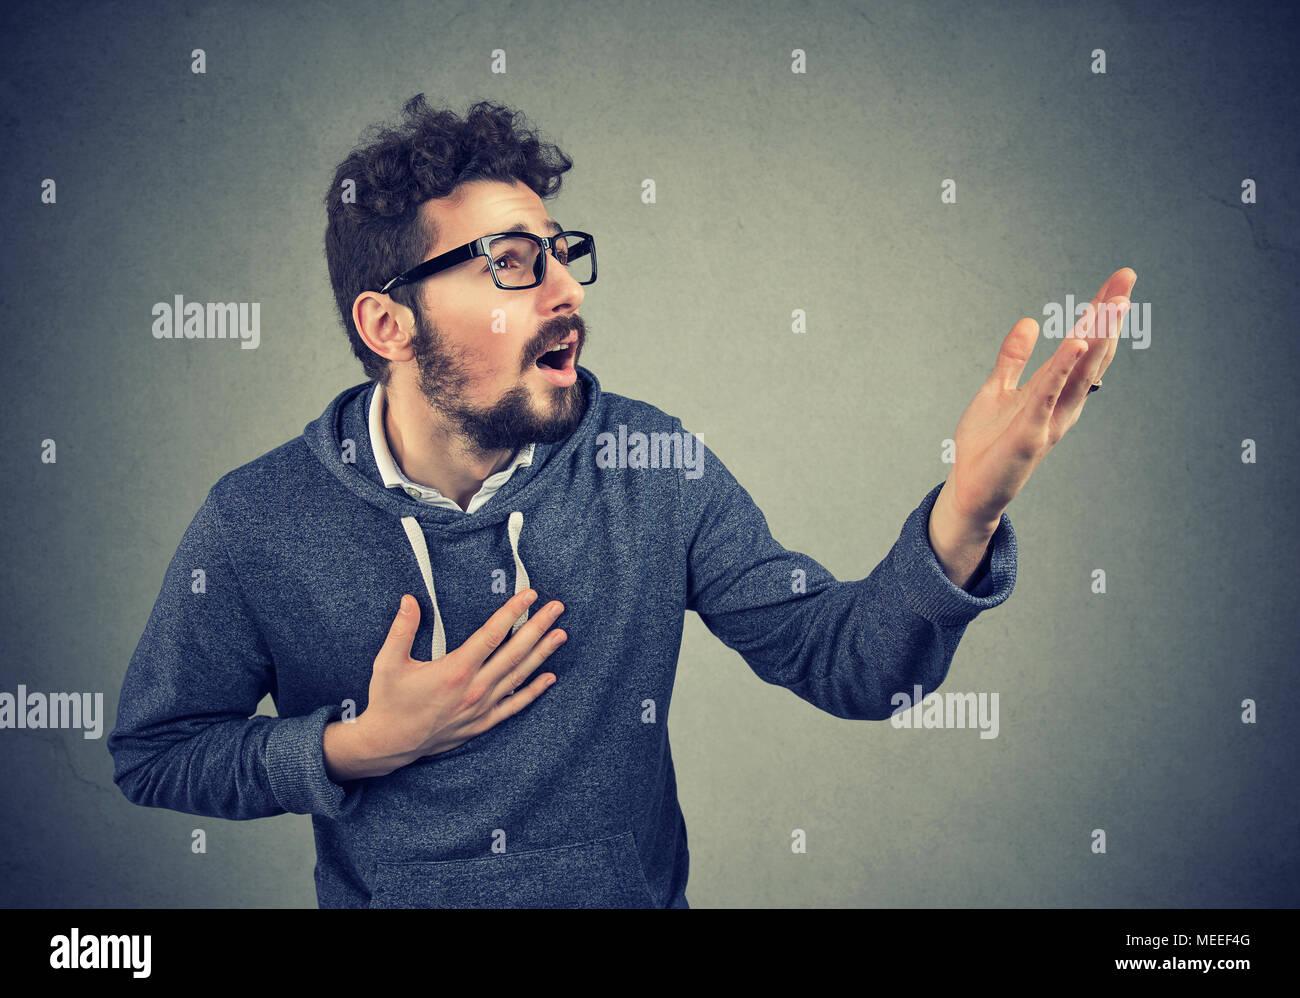 Desperate beard man screaming asking for help forgiveness - Stock Image